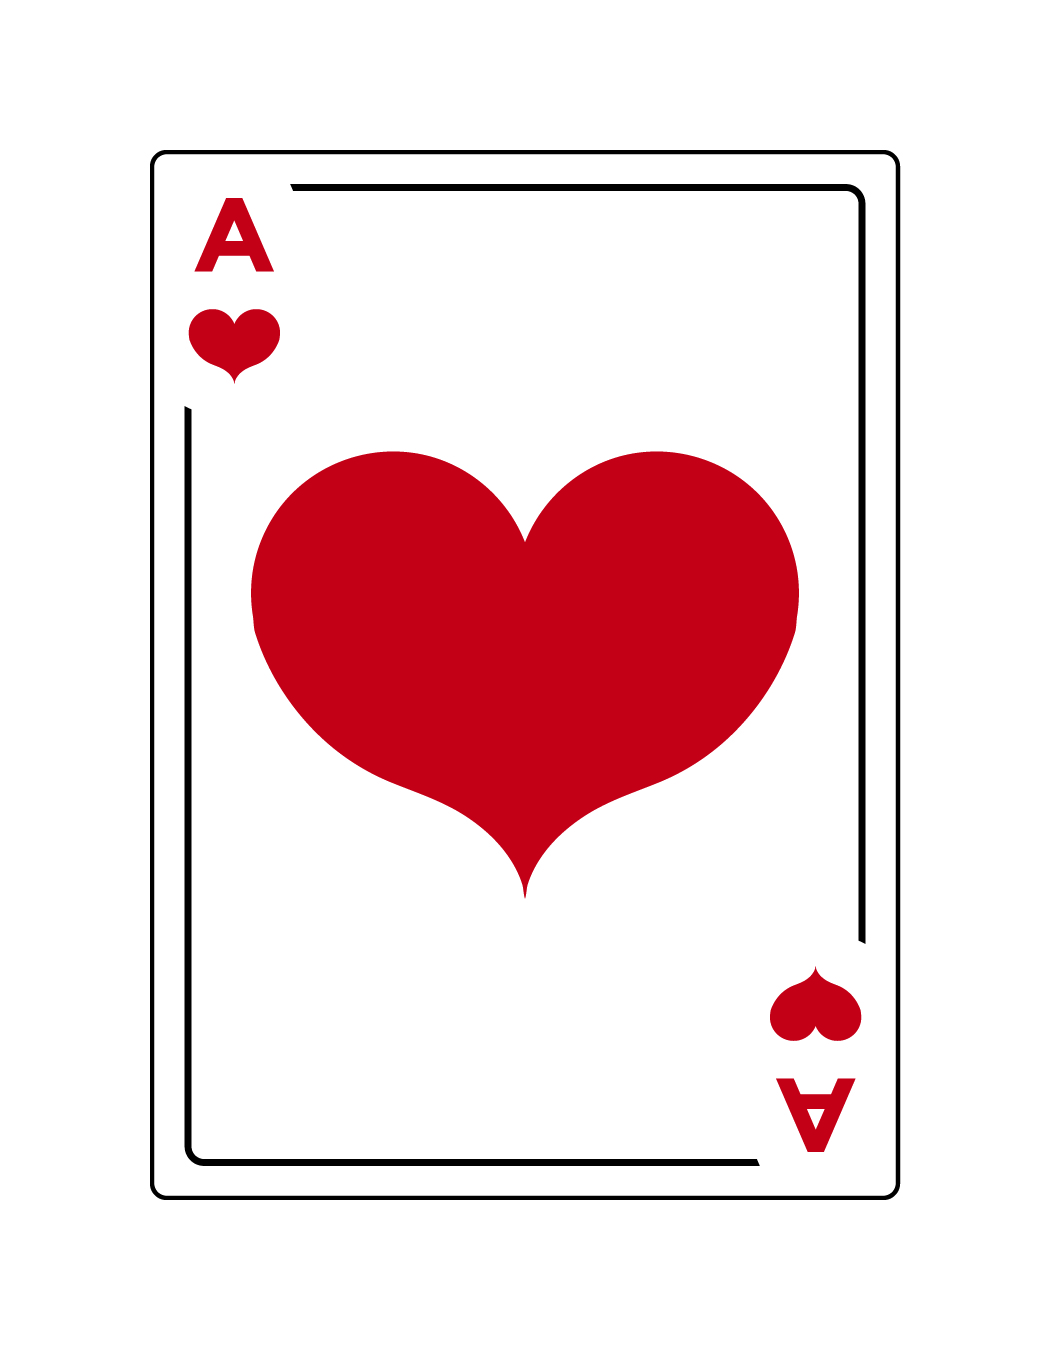 card_draft_1-55.jpg